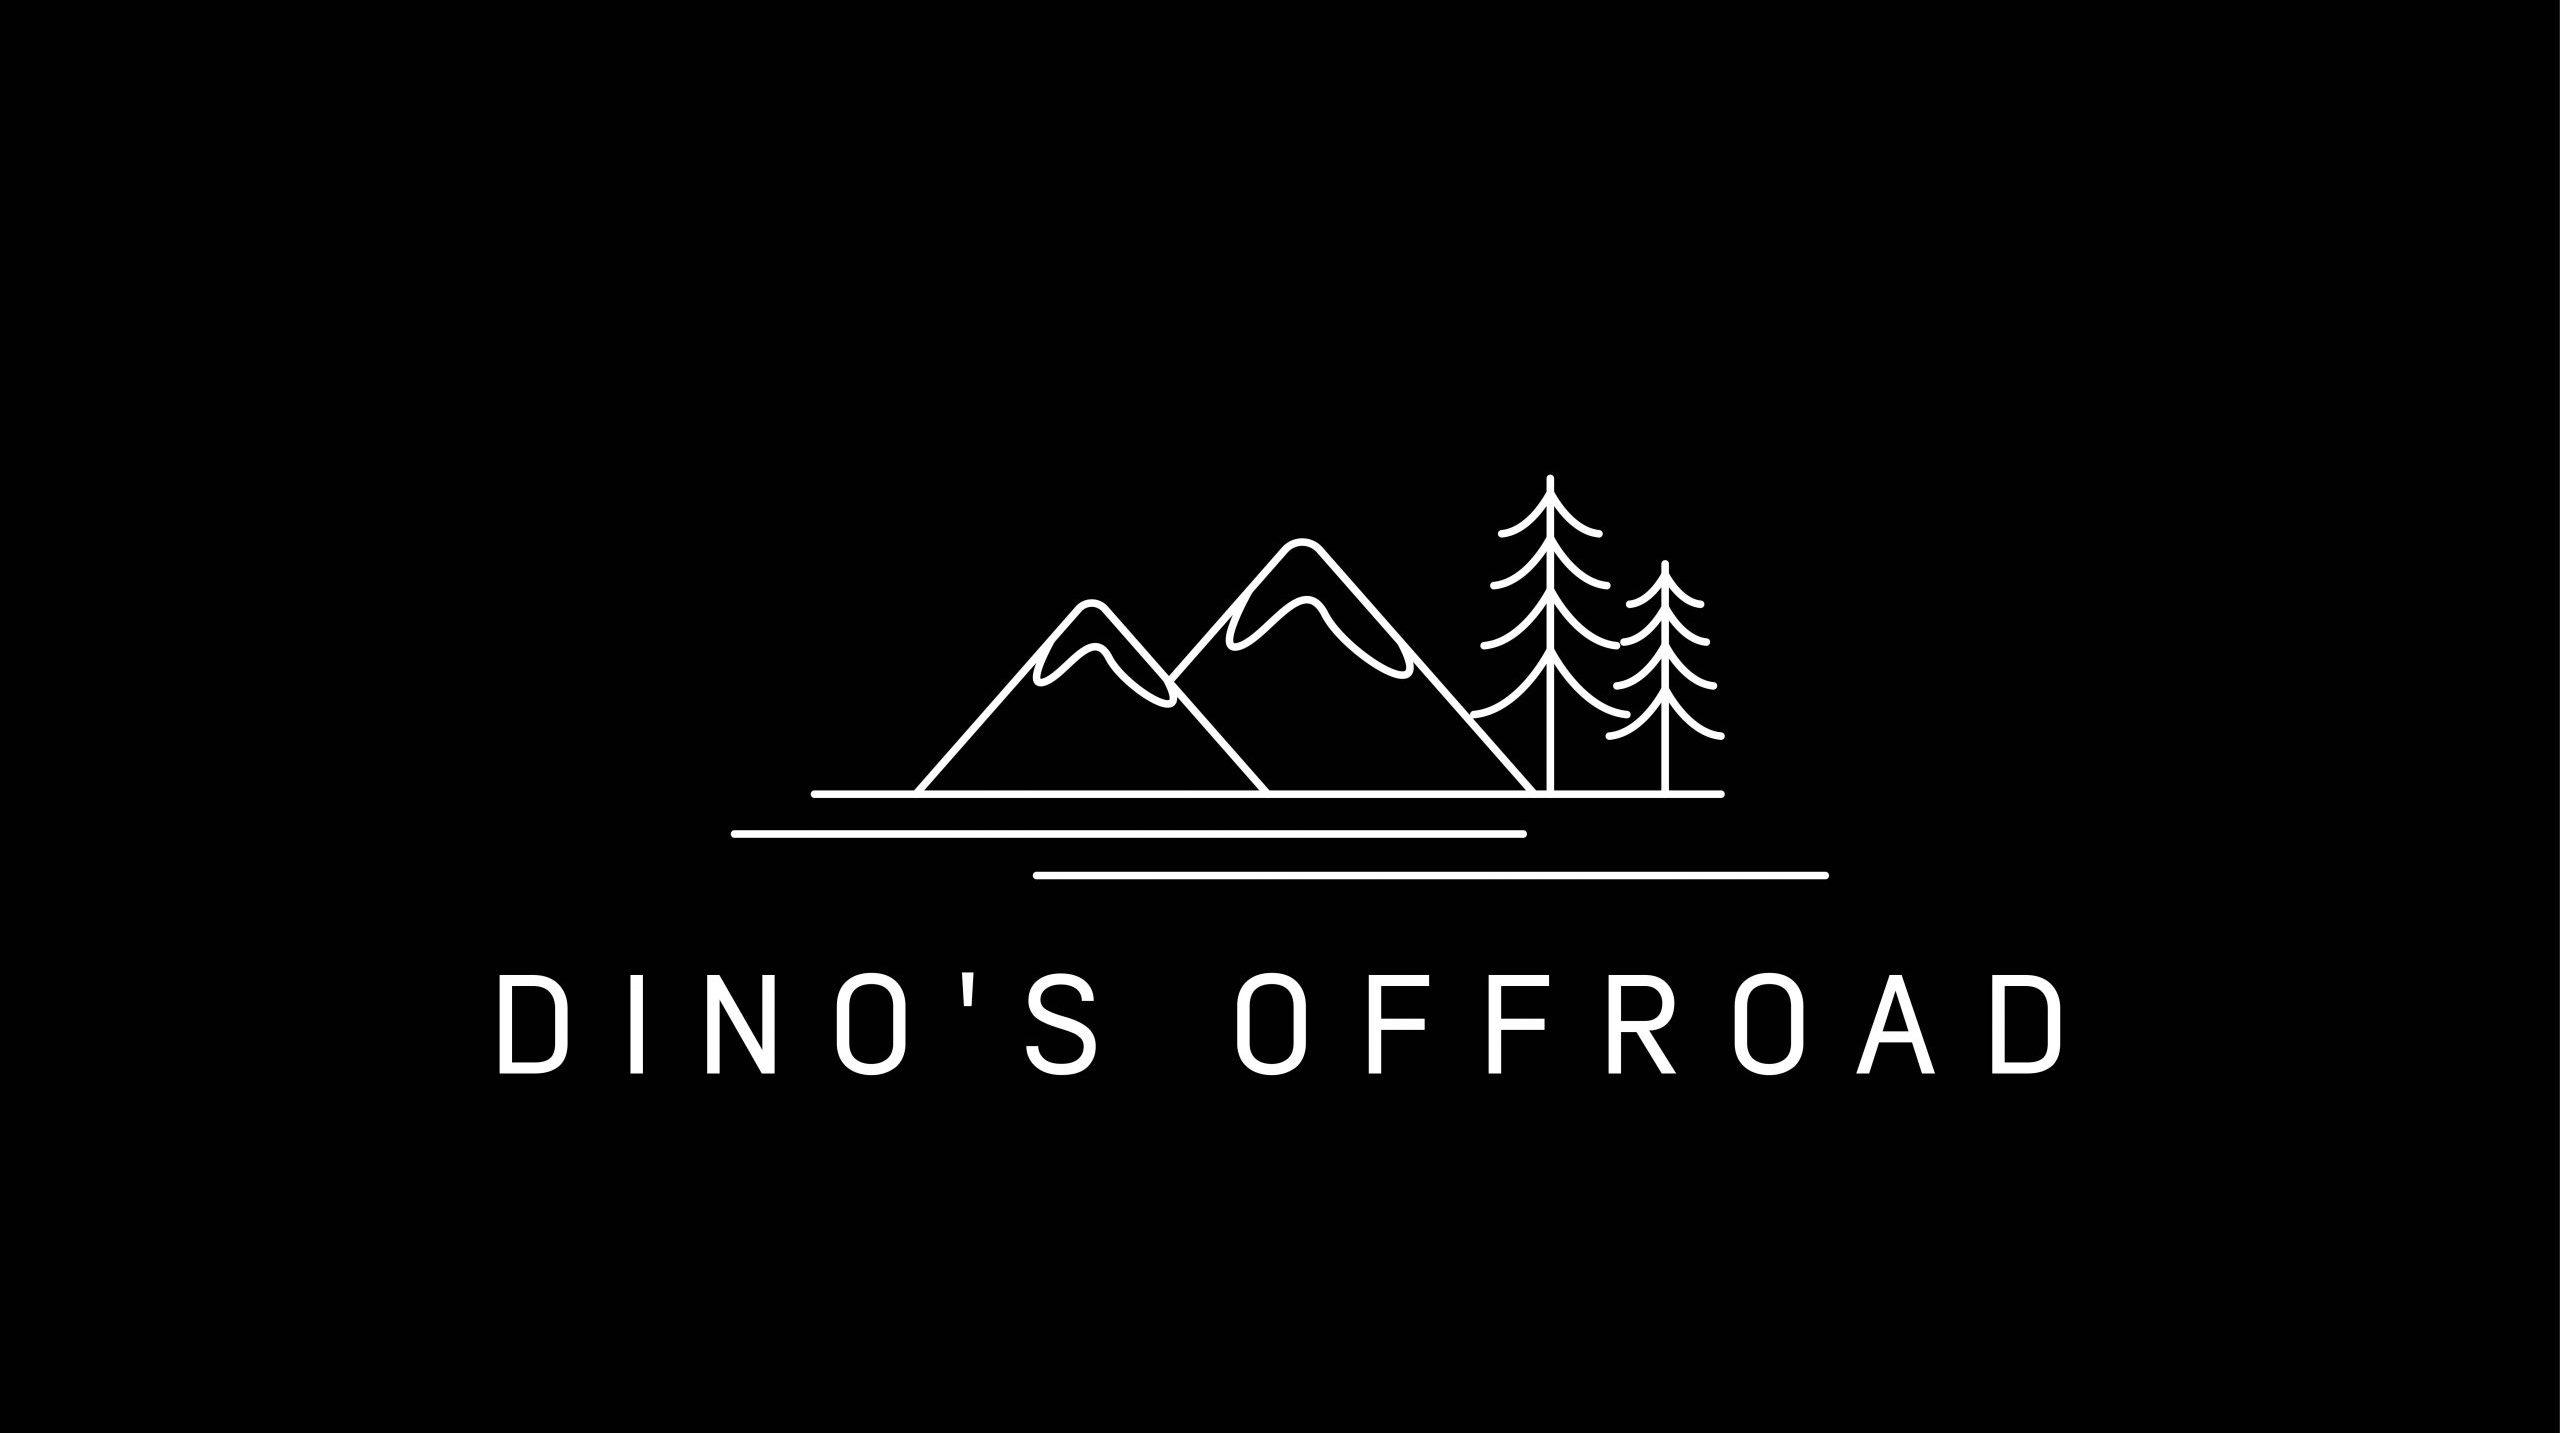 Dino's Offroad LLC